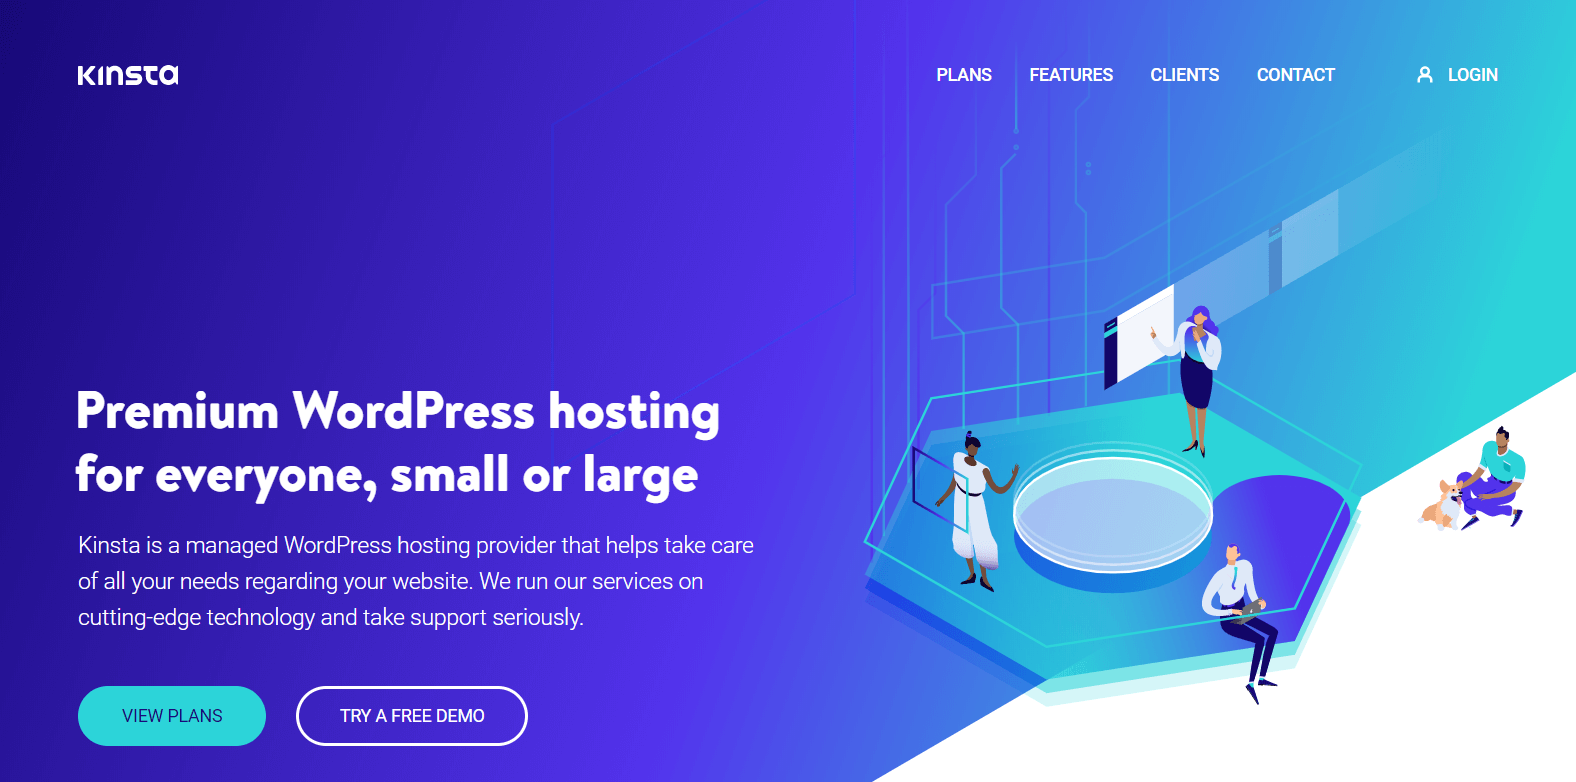 Fastest WordPress hosting: Kinsta